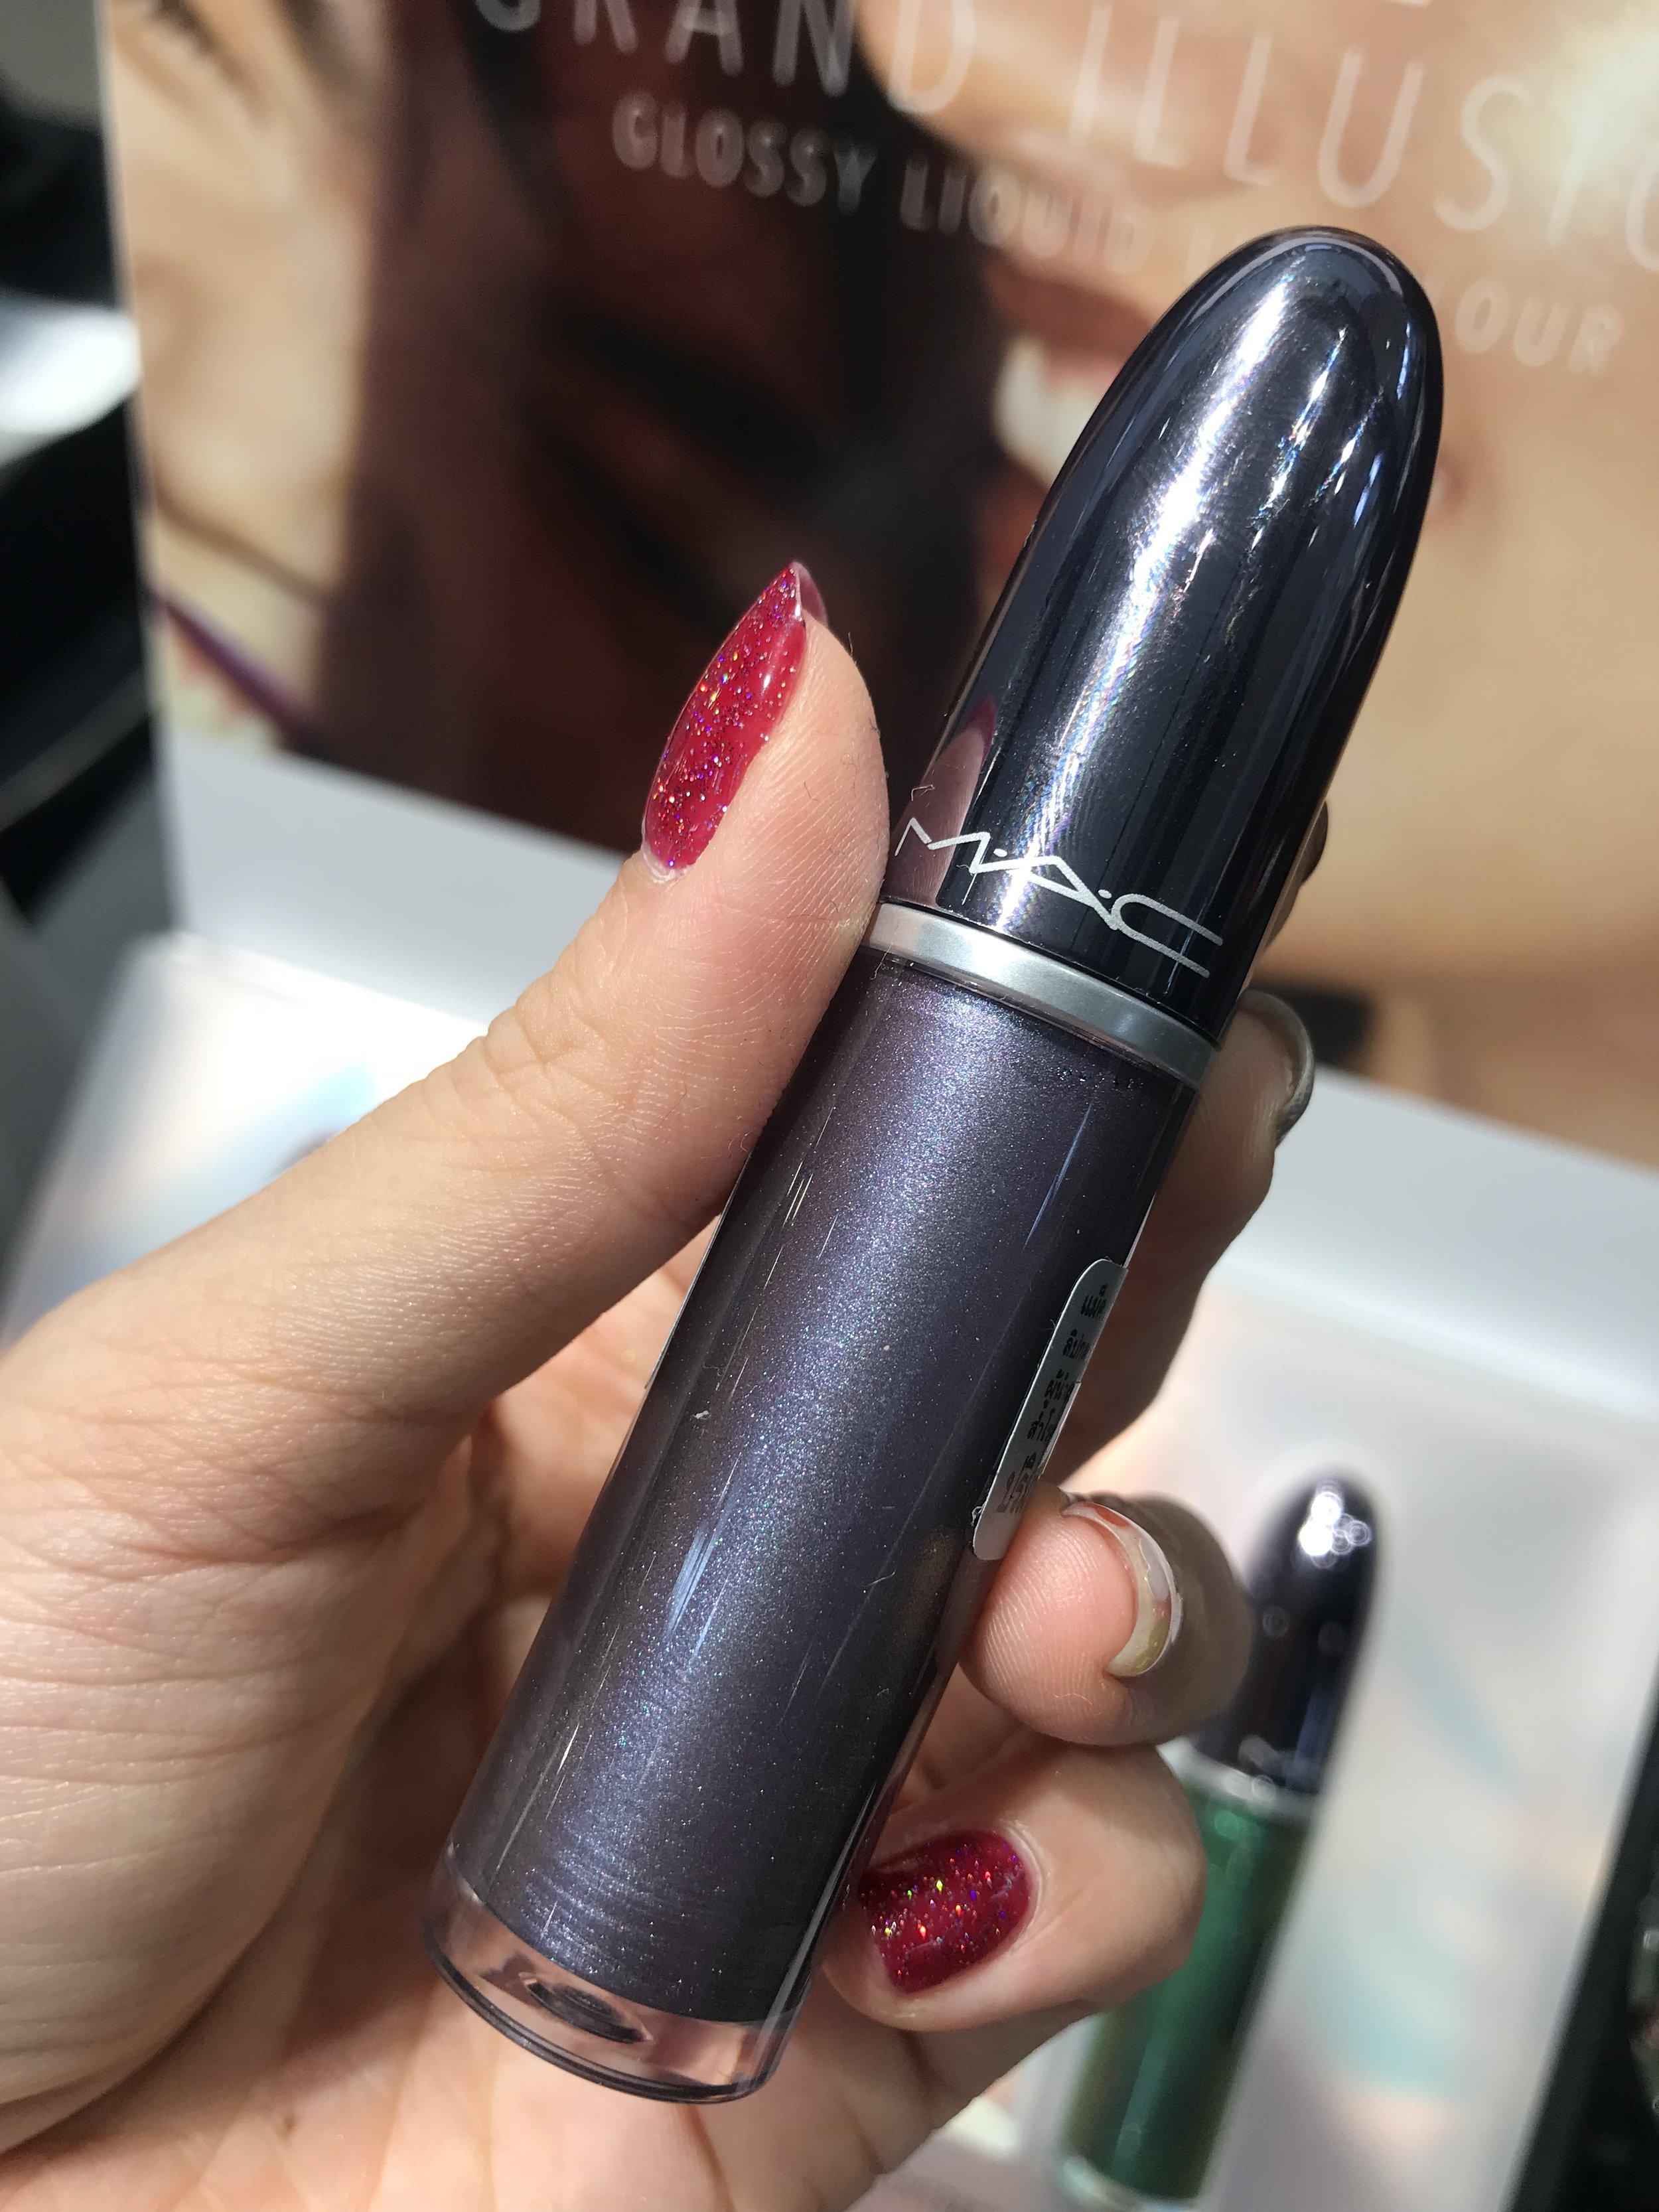 Mac Grand Illusion lipstick Sensory Overload